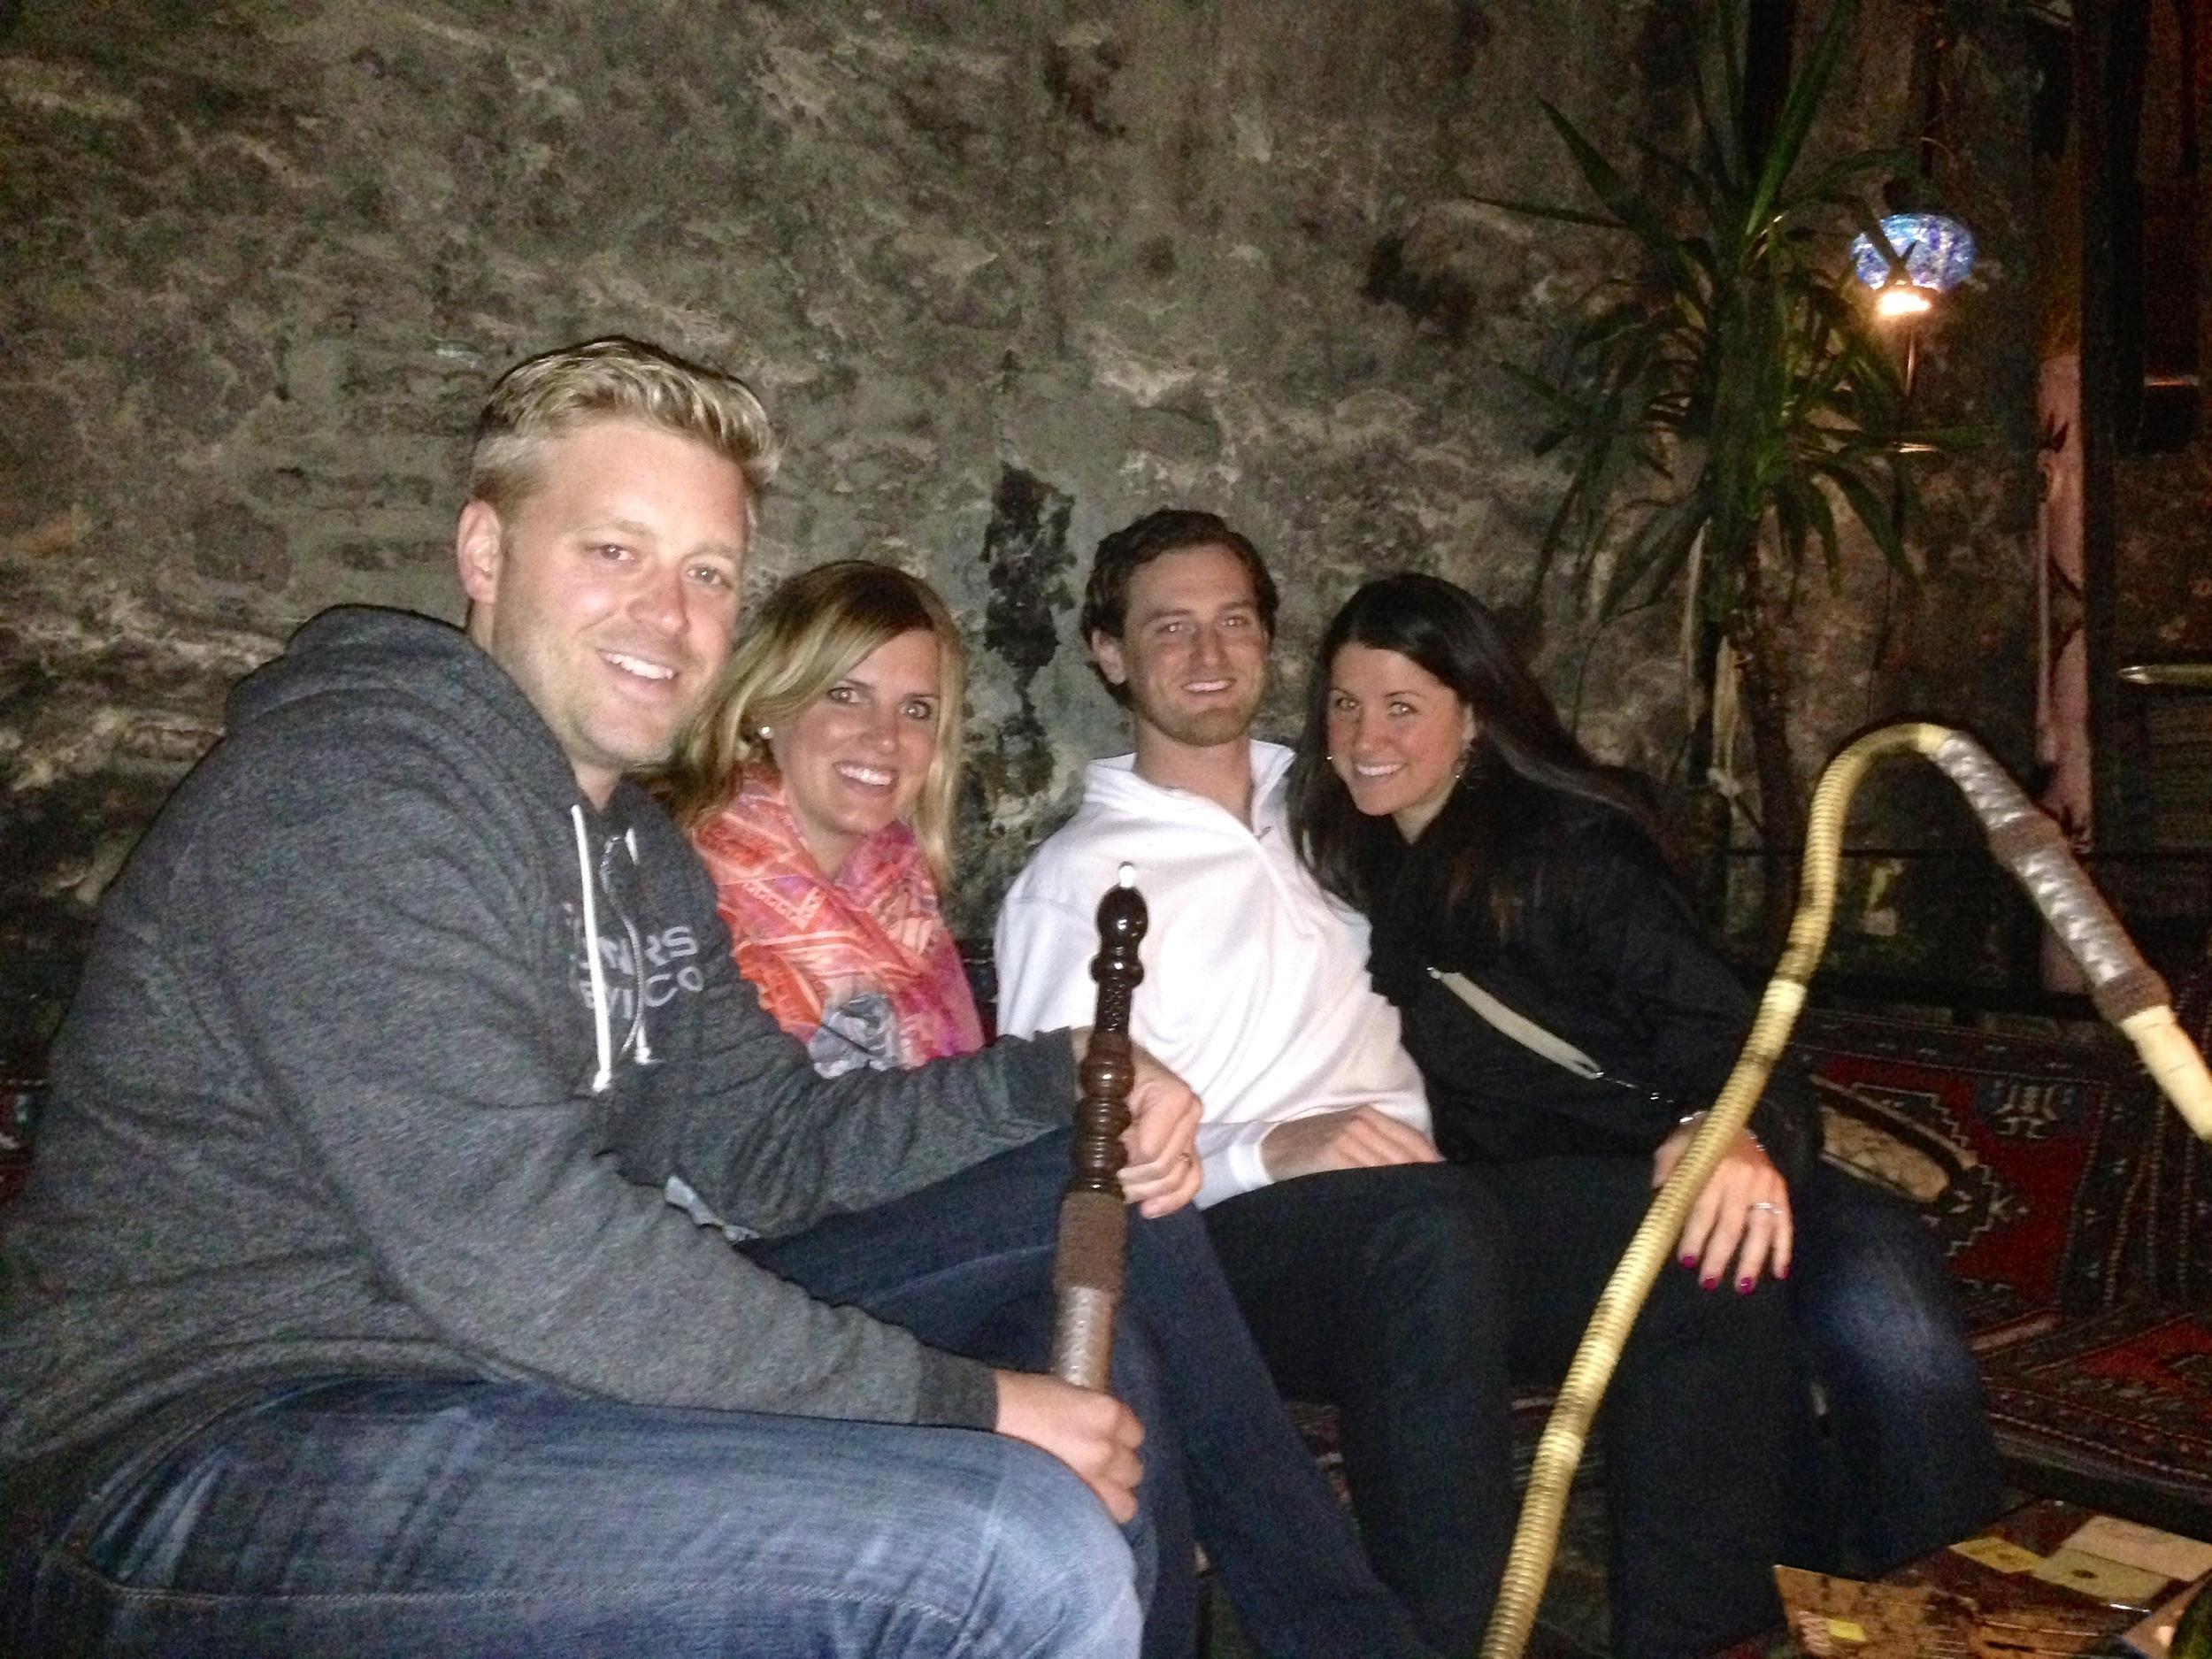 Josh, Emily, Jeff, and Nichole smoking hookah in Istanbul, Turkey